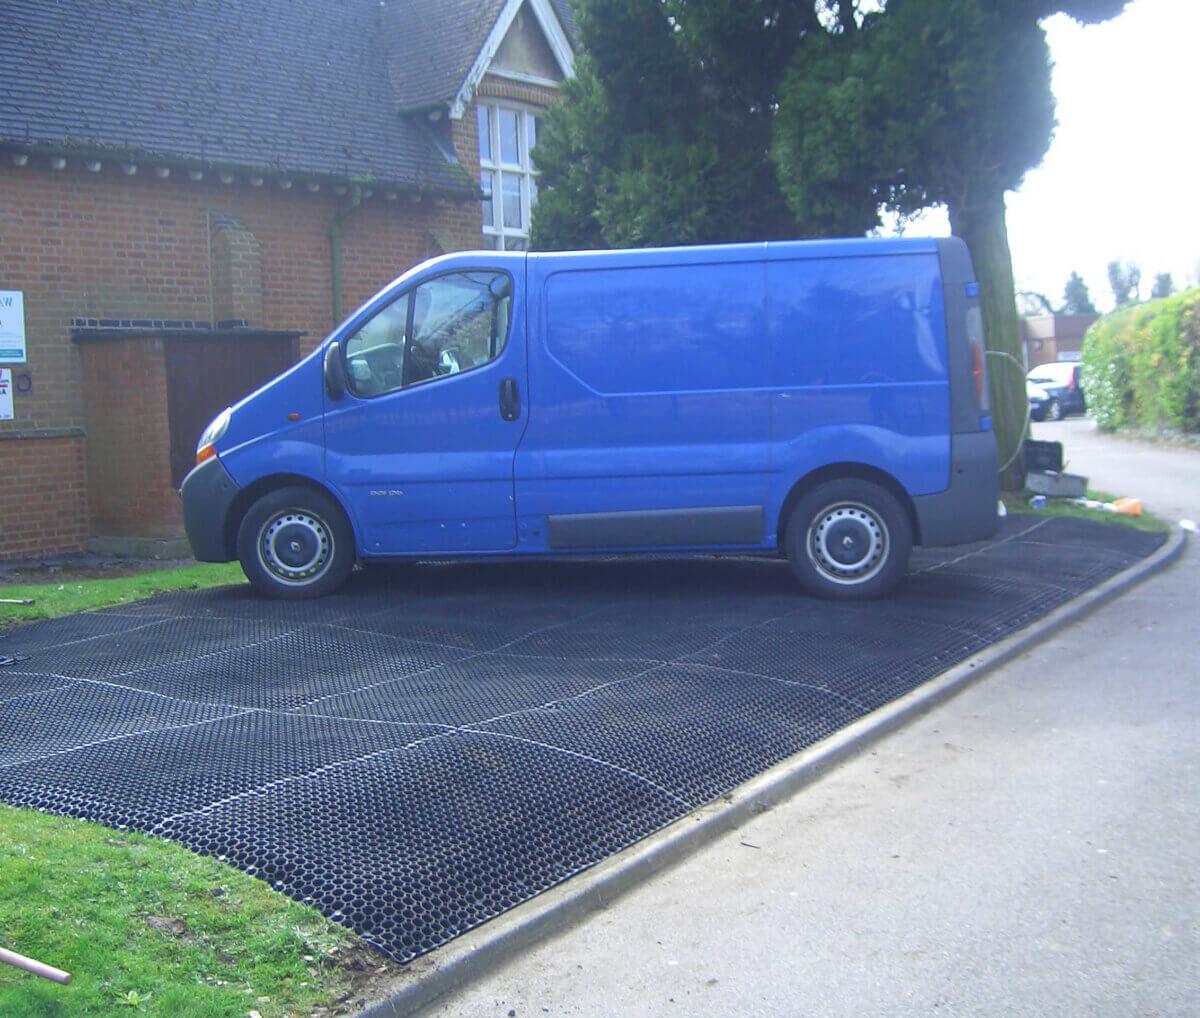 Rubber mat for outdoor